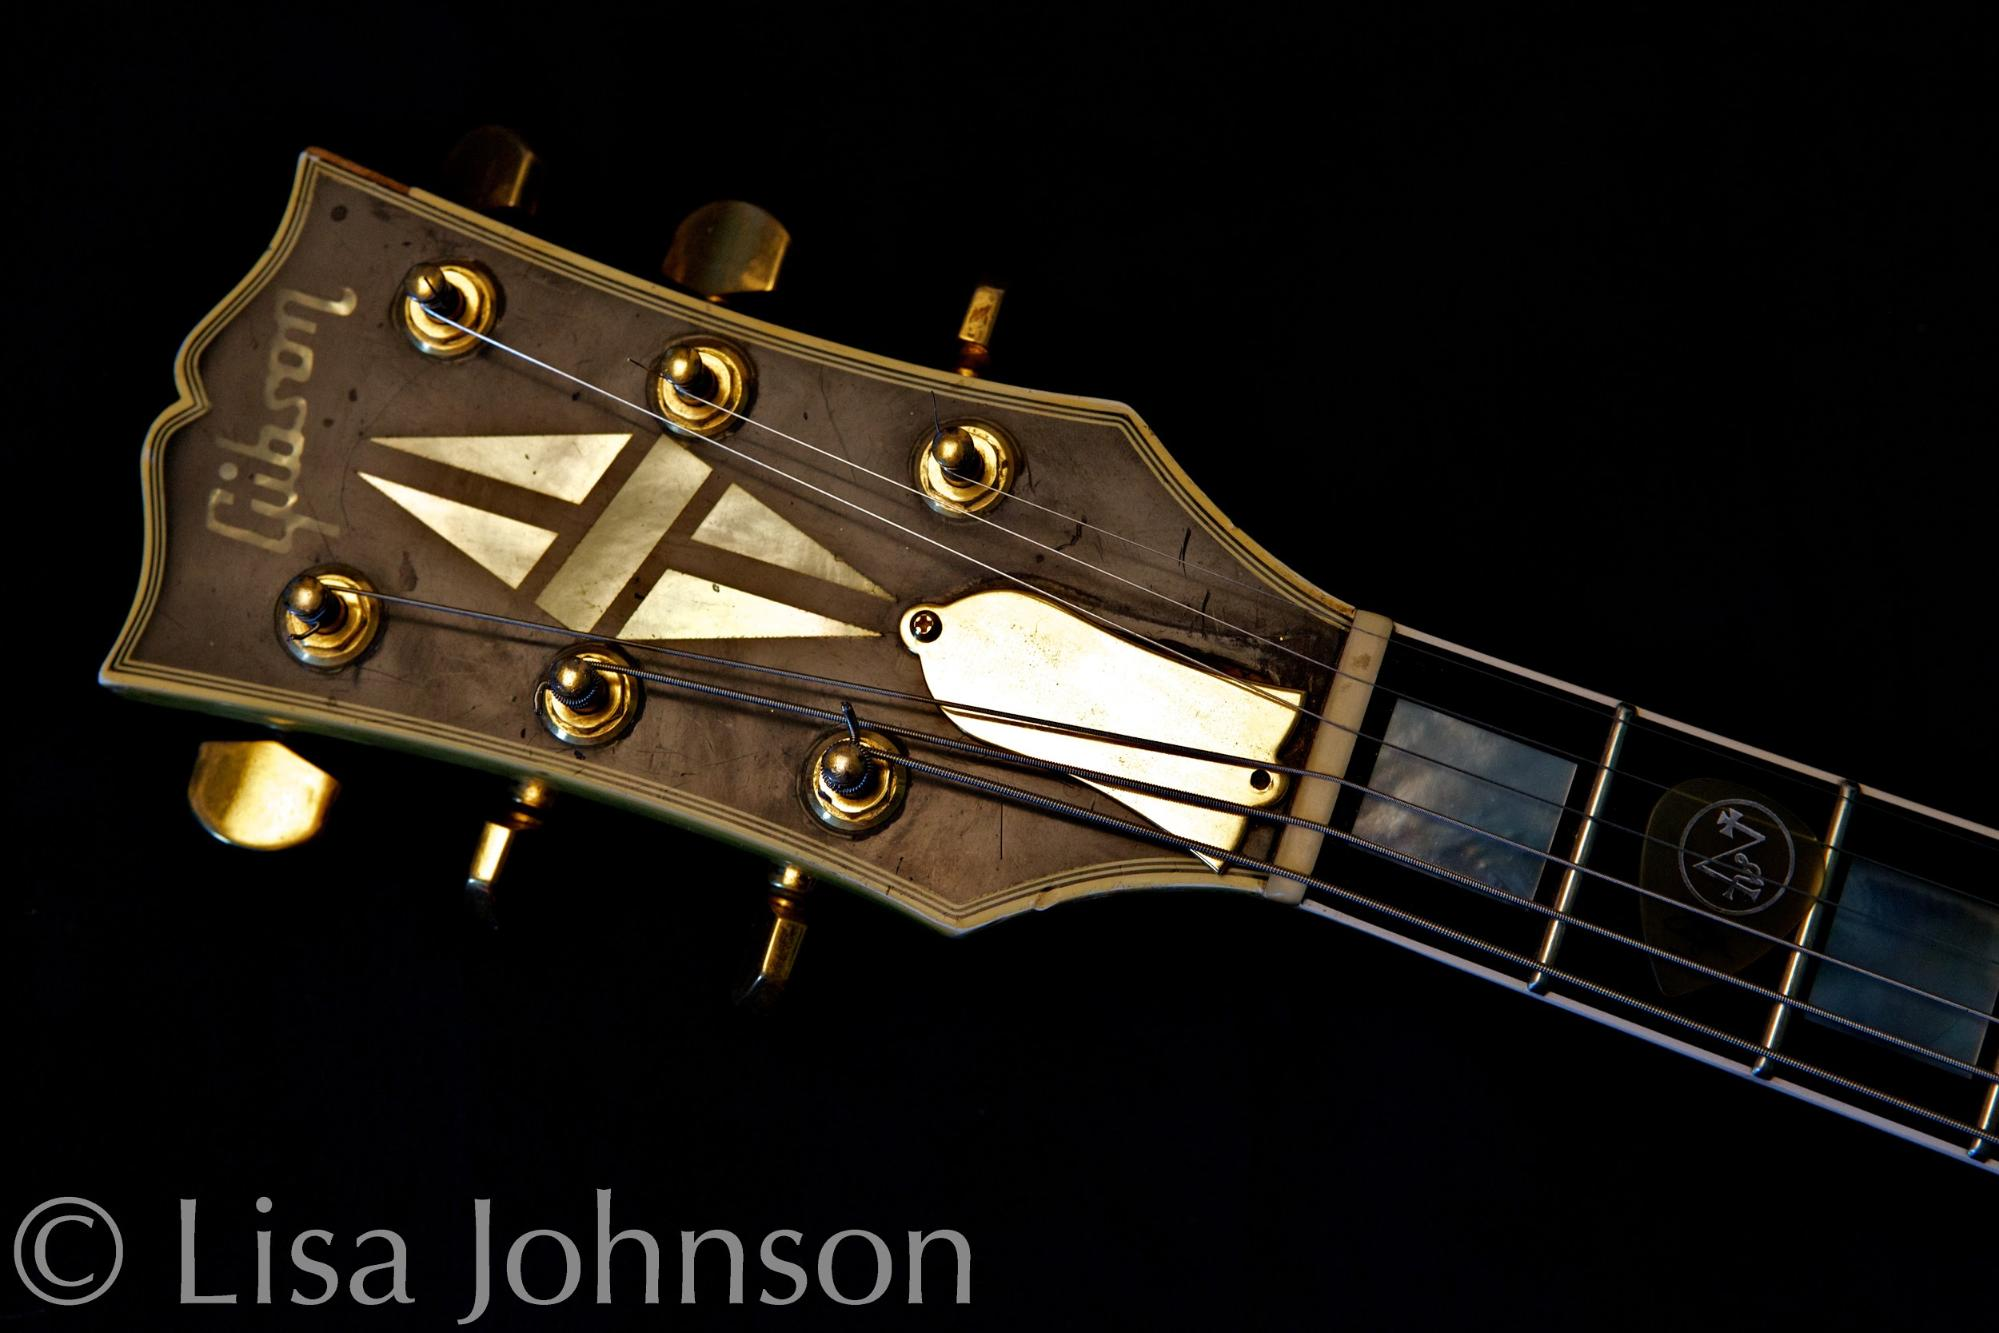 Happy birthday Zakk Wylde! Here\s Zakk s 1981 Gibson Les Paul